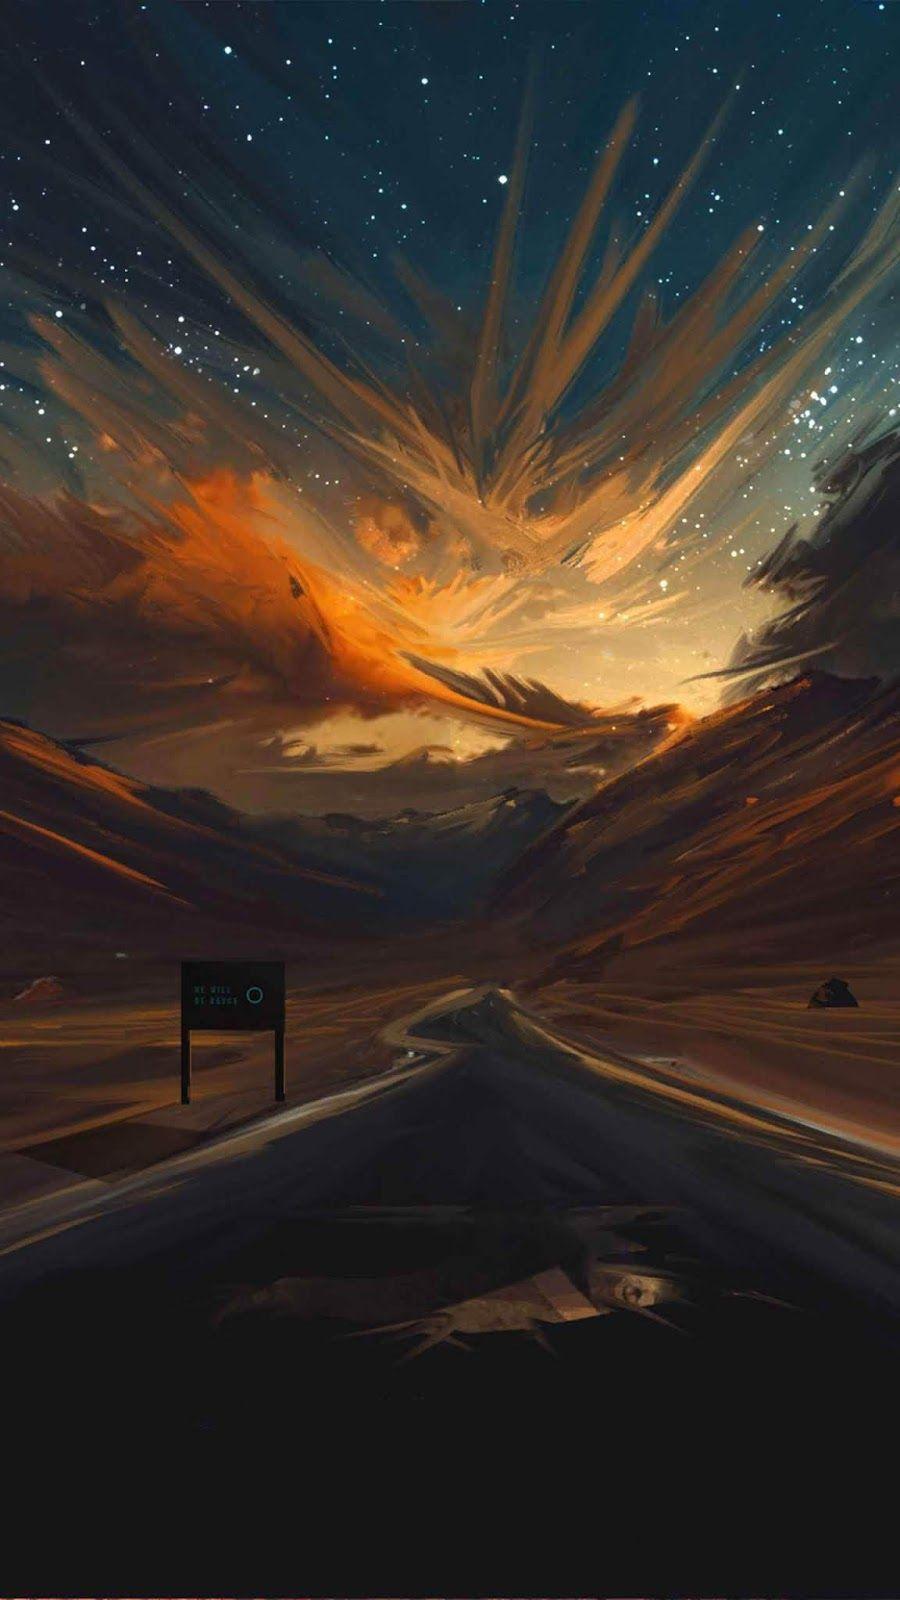 Sunset Road Wallpaper In 2019 Artistic Wallpaper Iphone